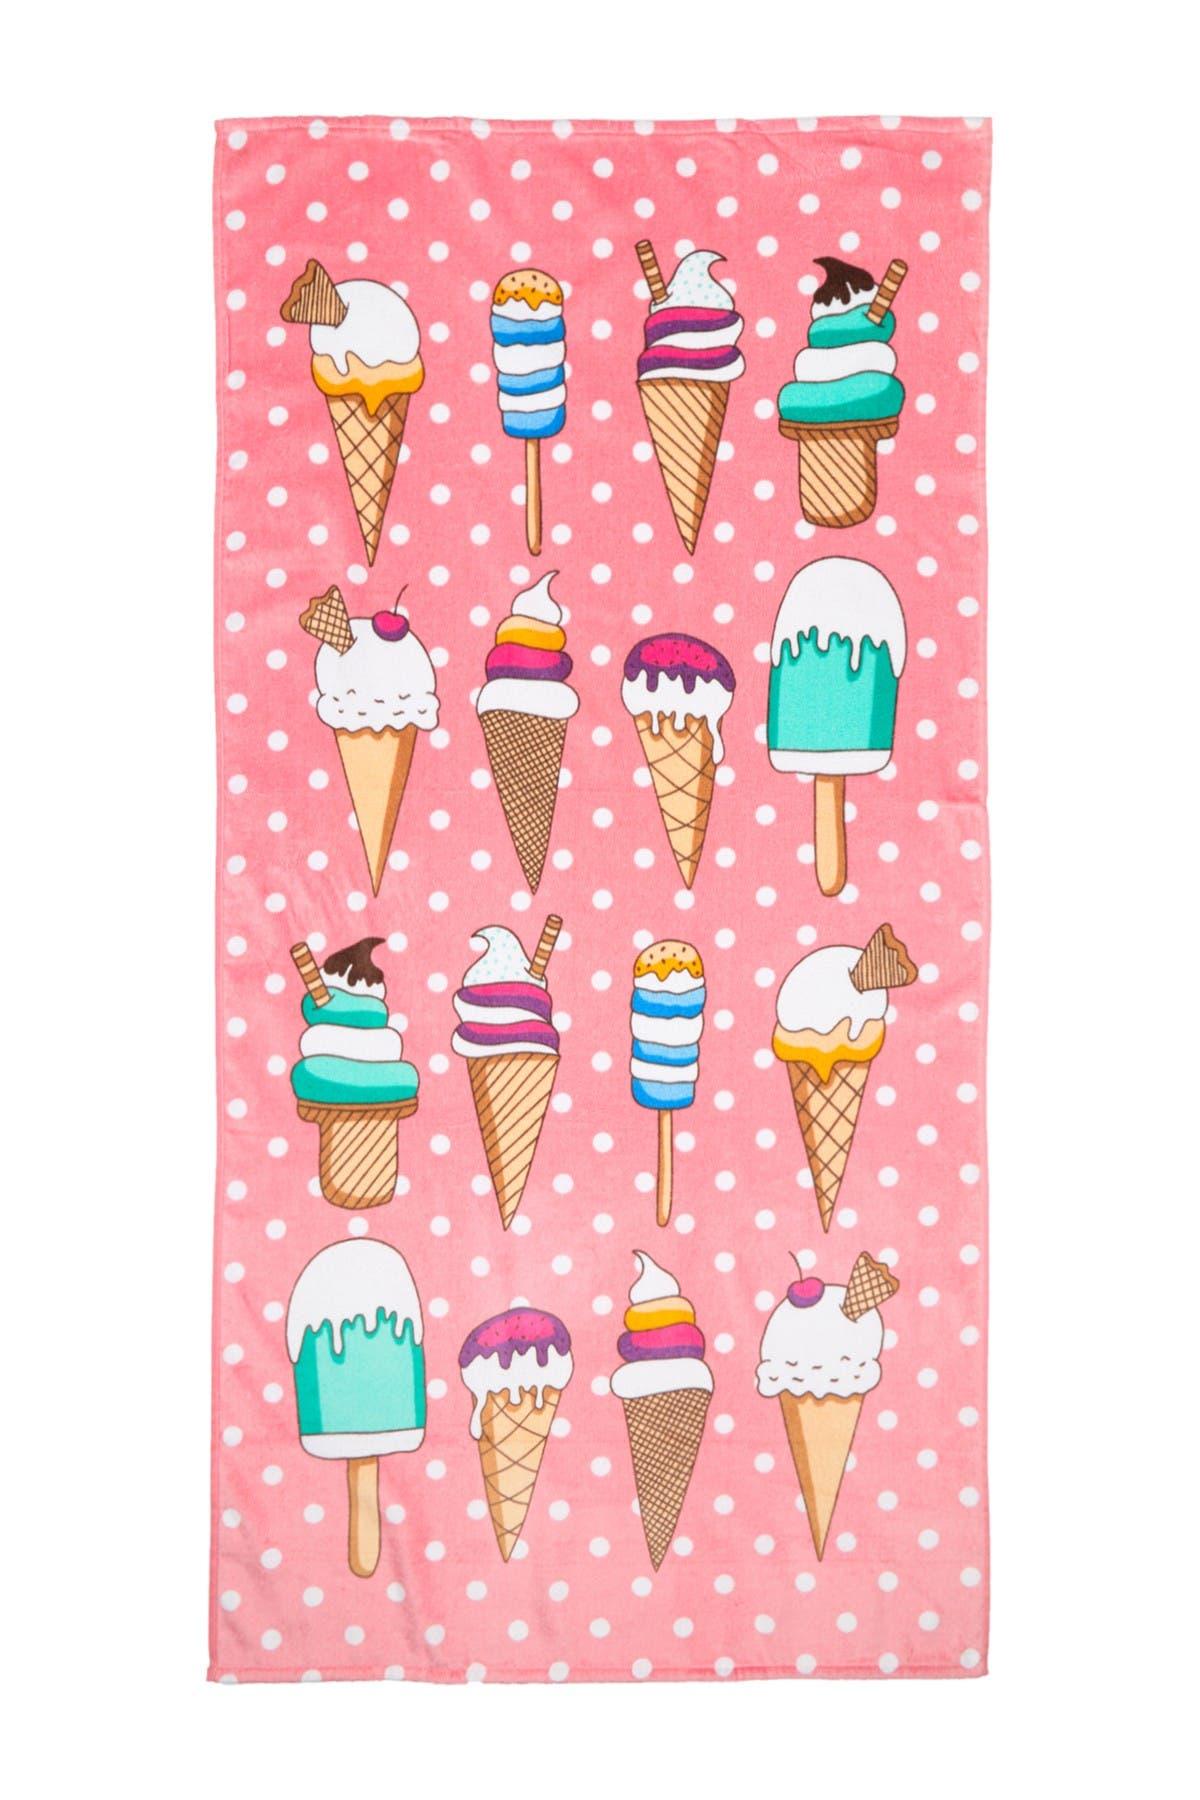 Image of Apollo Towels Ice Cream Print Beach Towel